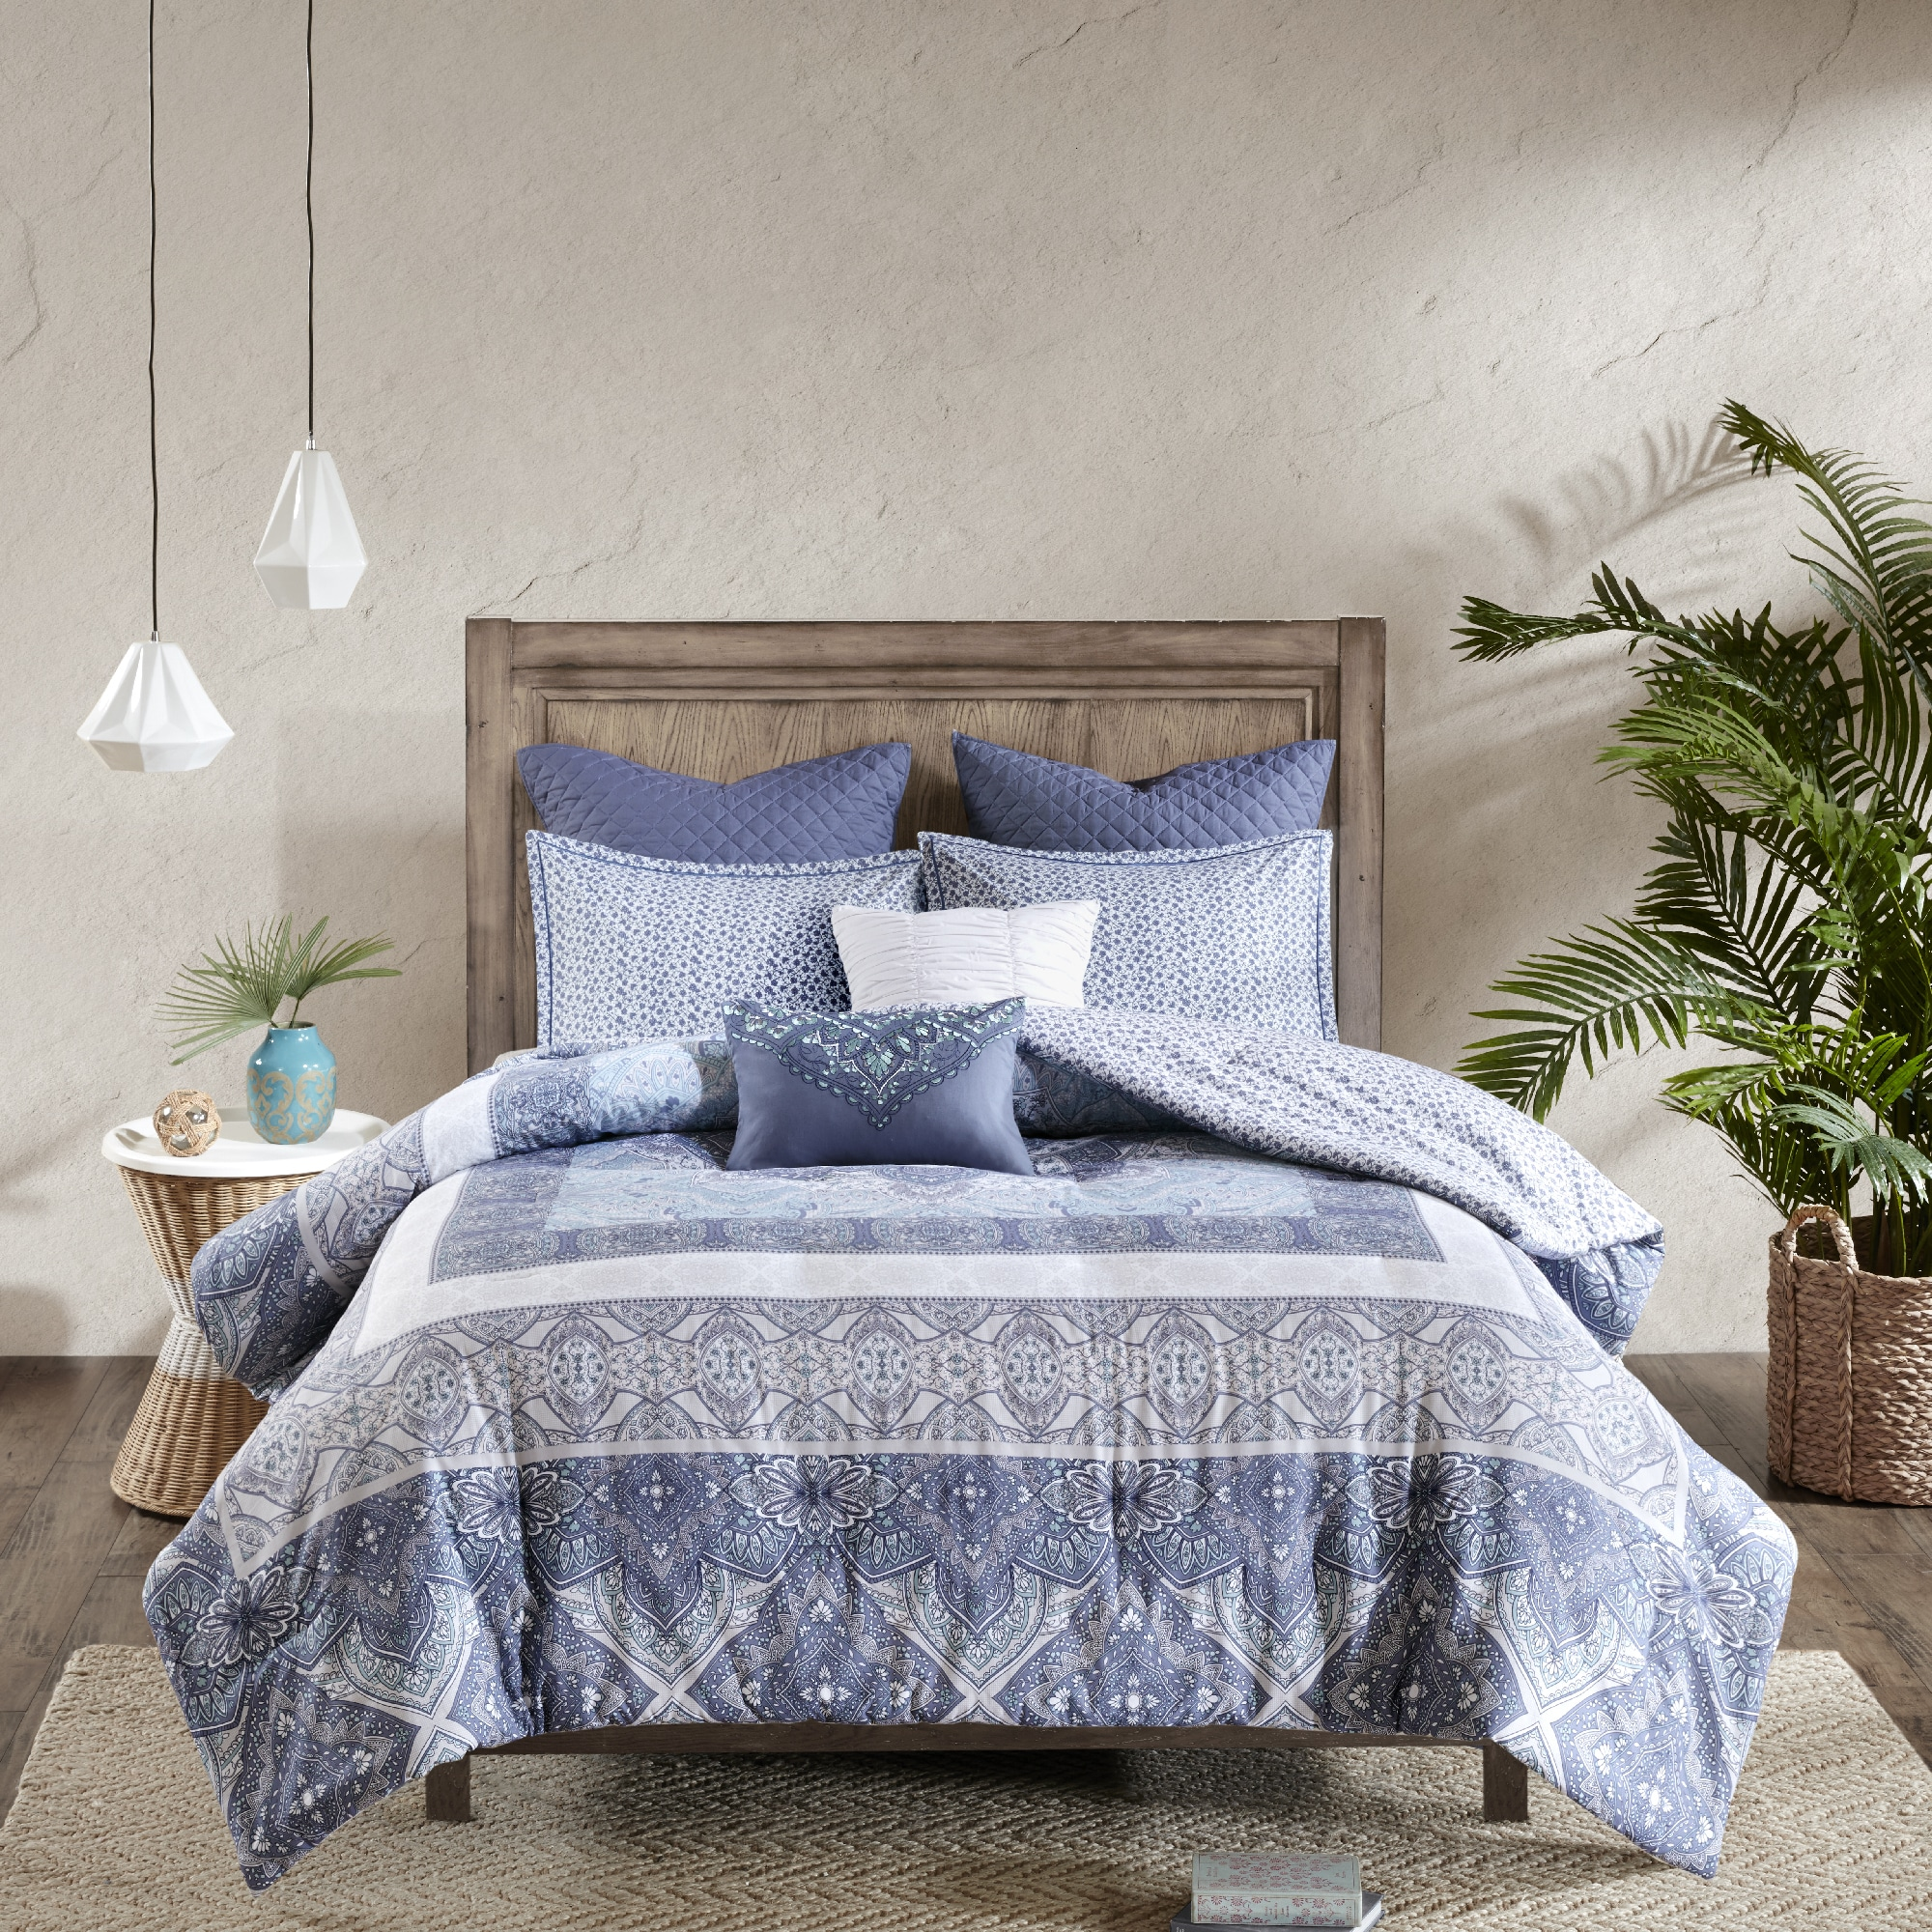 co insert best for barn cozy alternative duvet pacific full comforter superloft down coast magnificent decoration amazon bedspreads pottery ideas goose bedroom fluffy